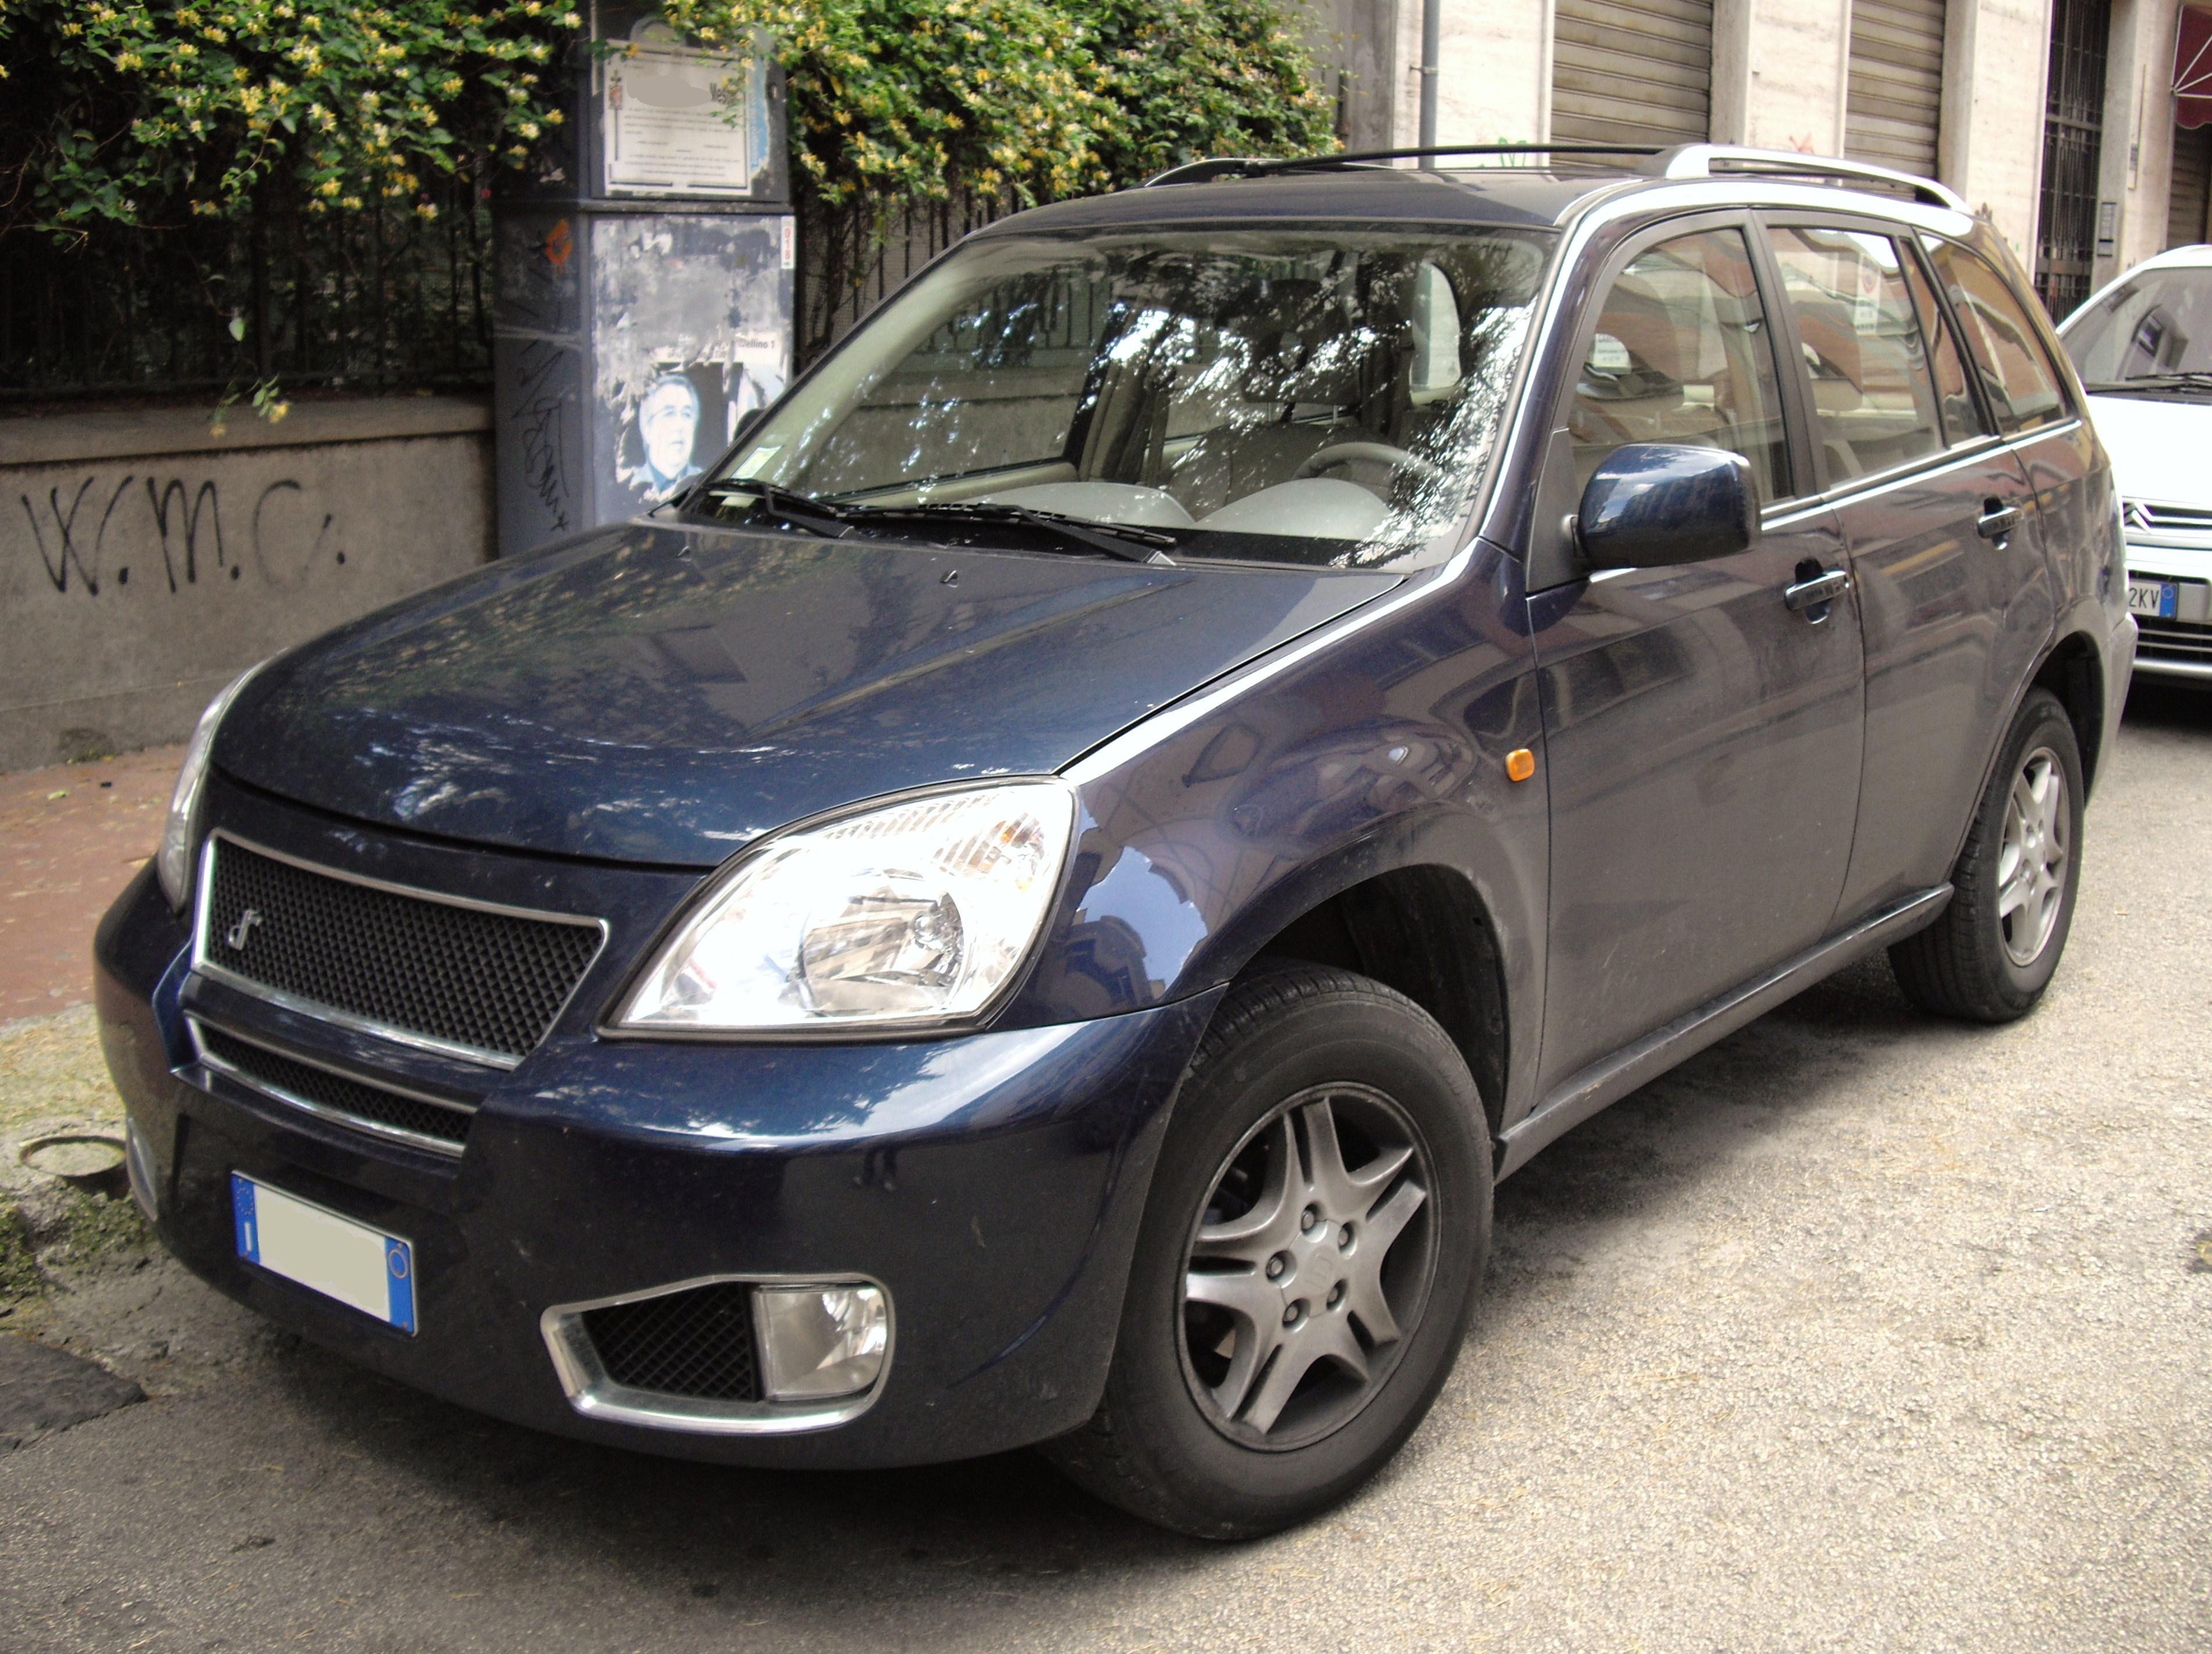 Dr motor company wikipedia autos post for Frederick subaru motor company